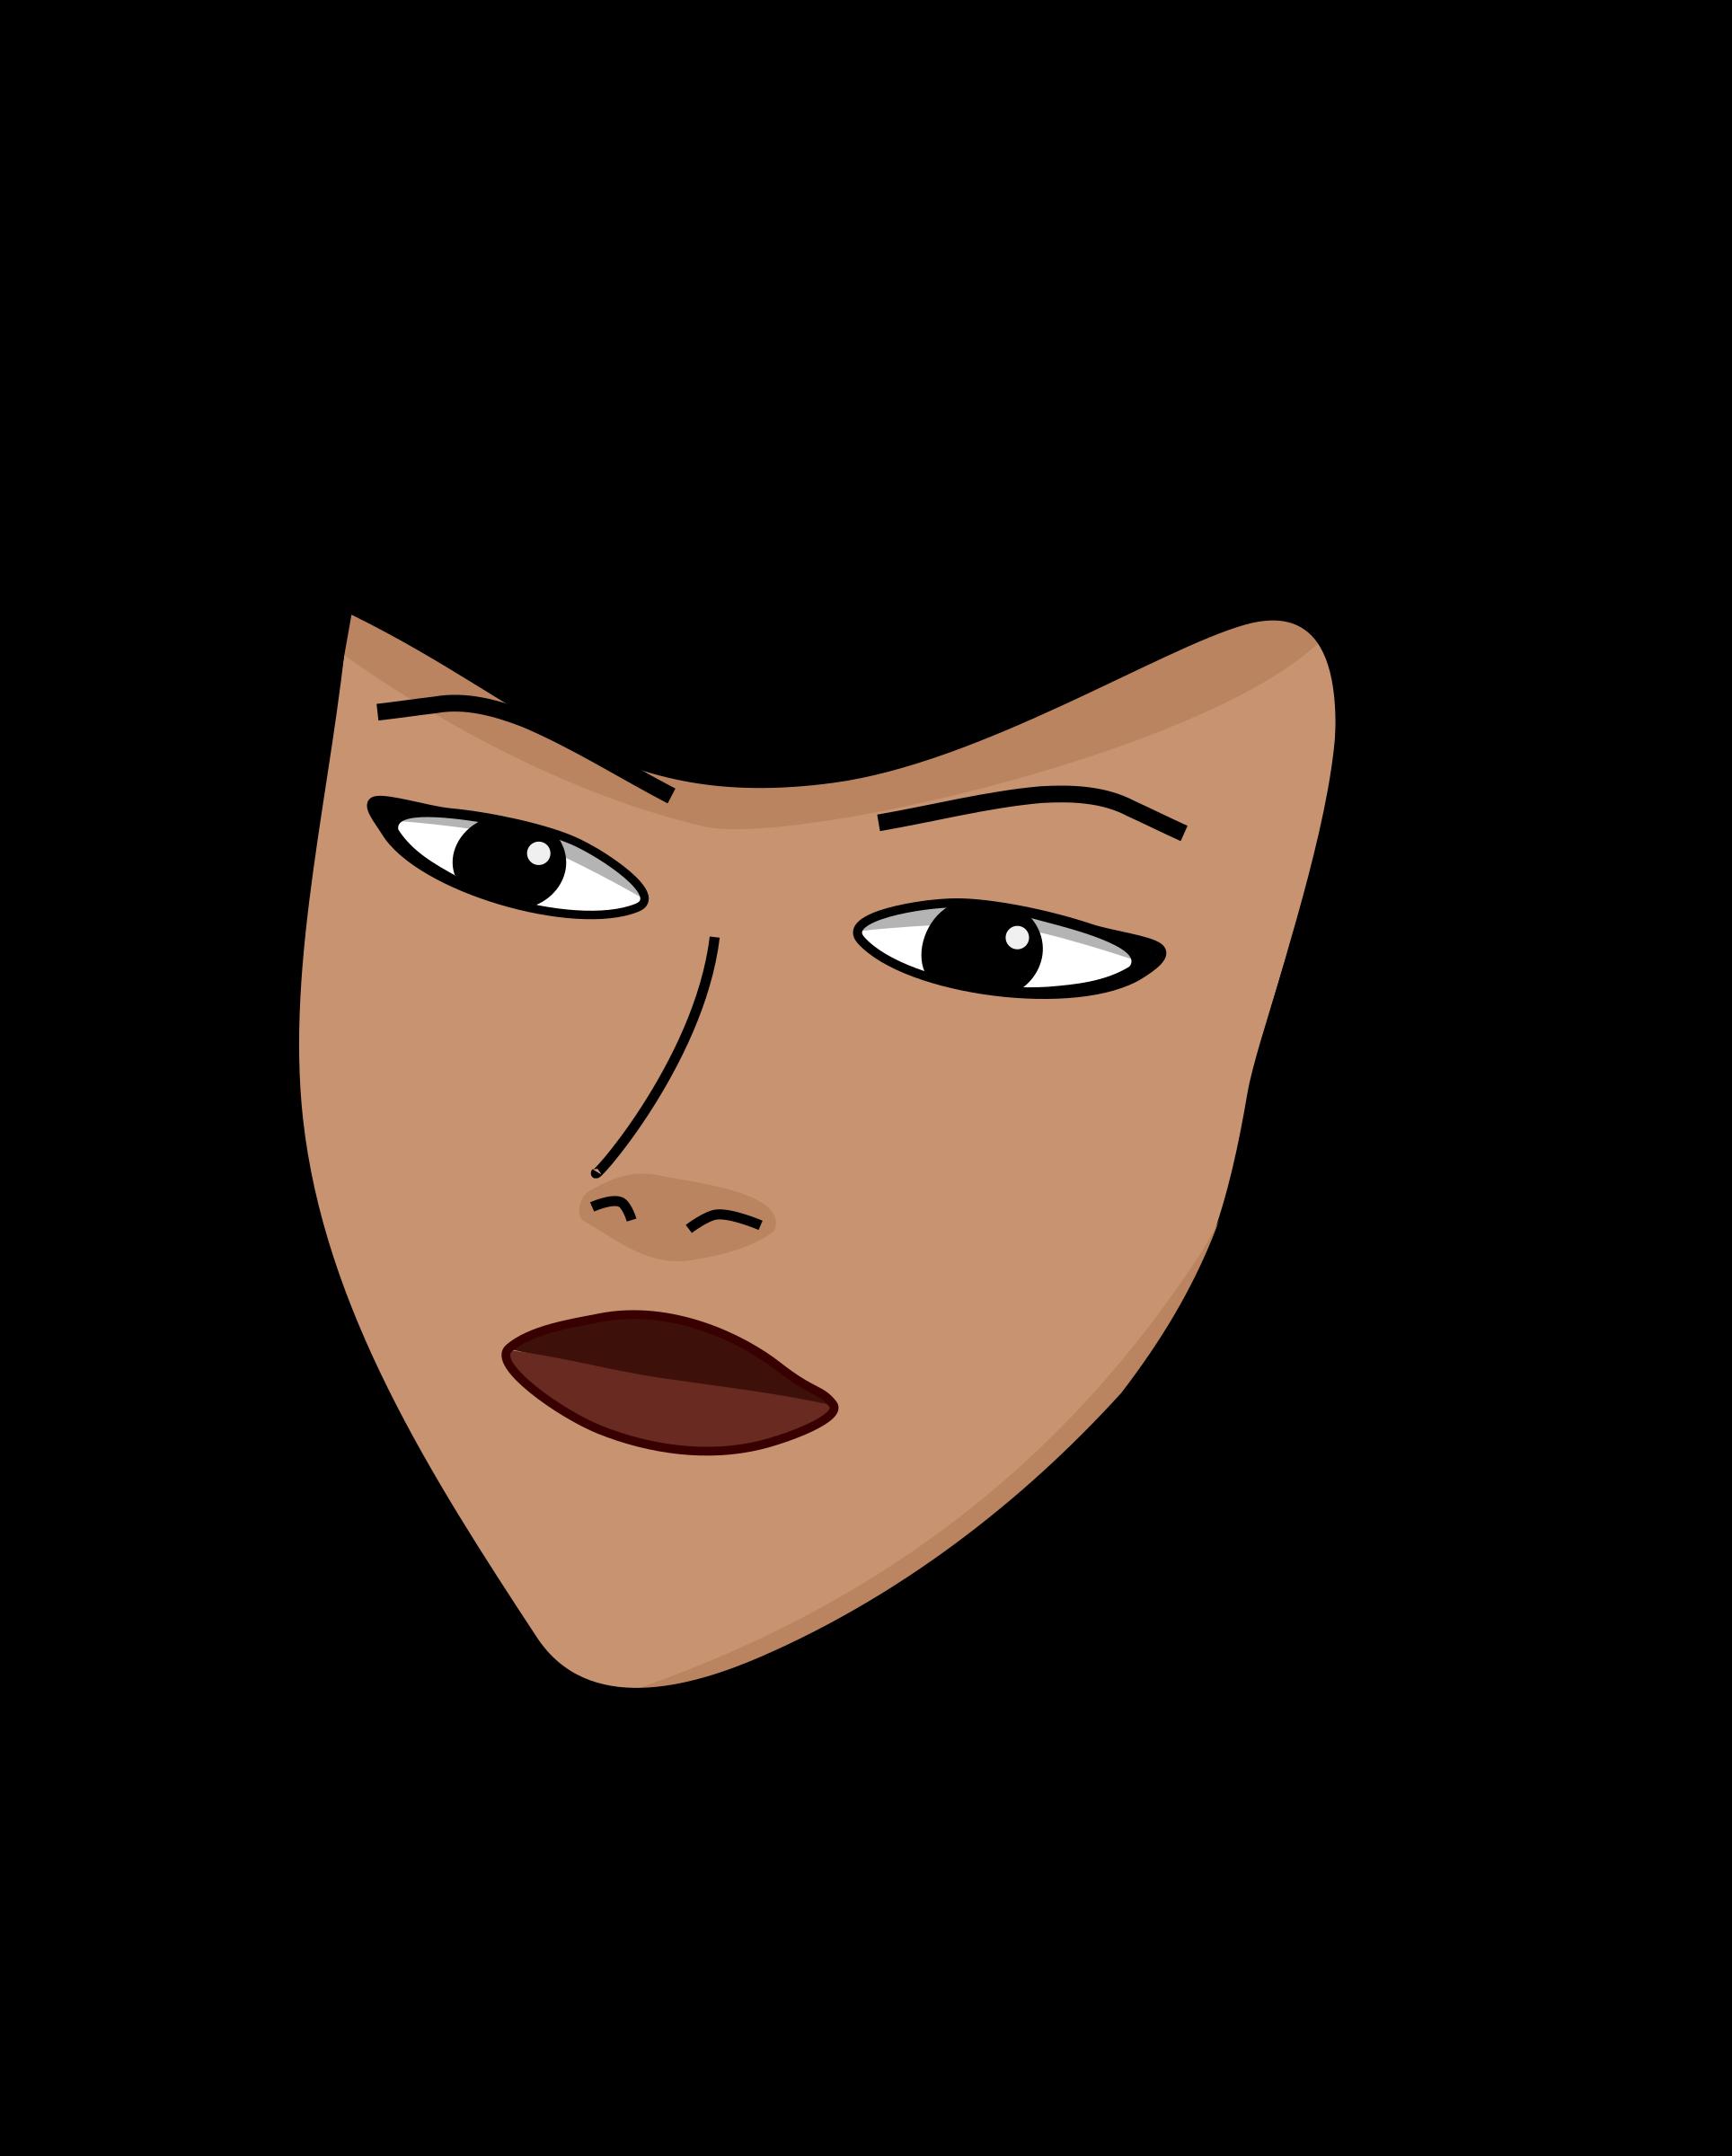 Female clipart professional. Portrait head pencil and